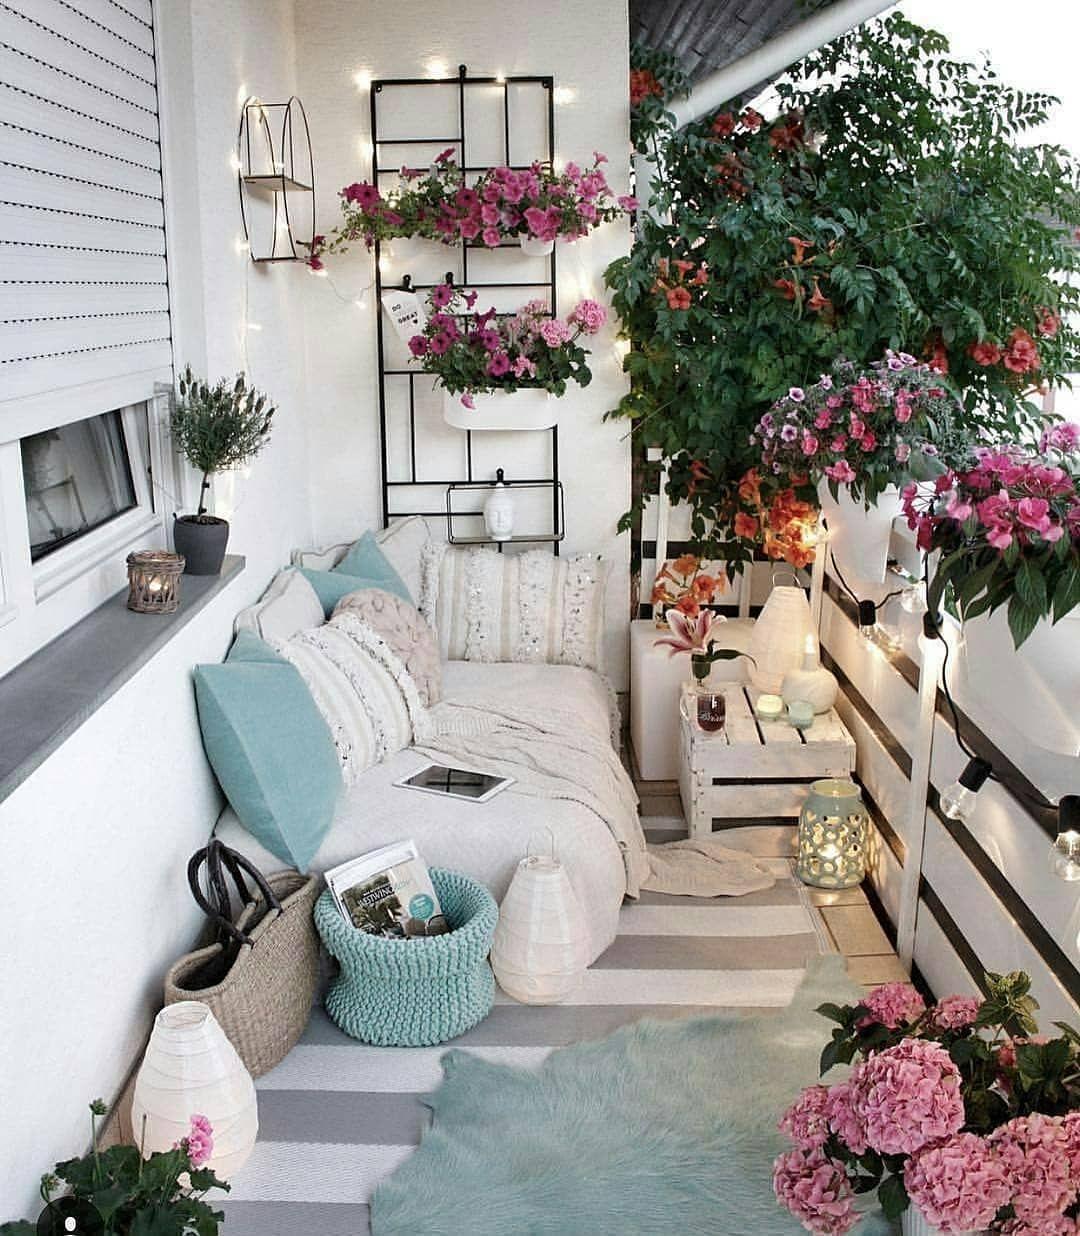 40 Cozy Balcony Ideas And Decor Inspiration 2019 Page 21 O